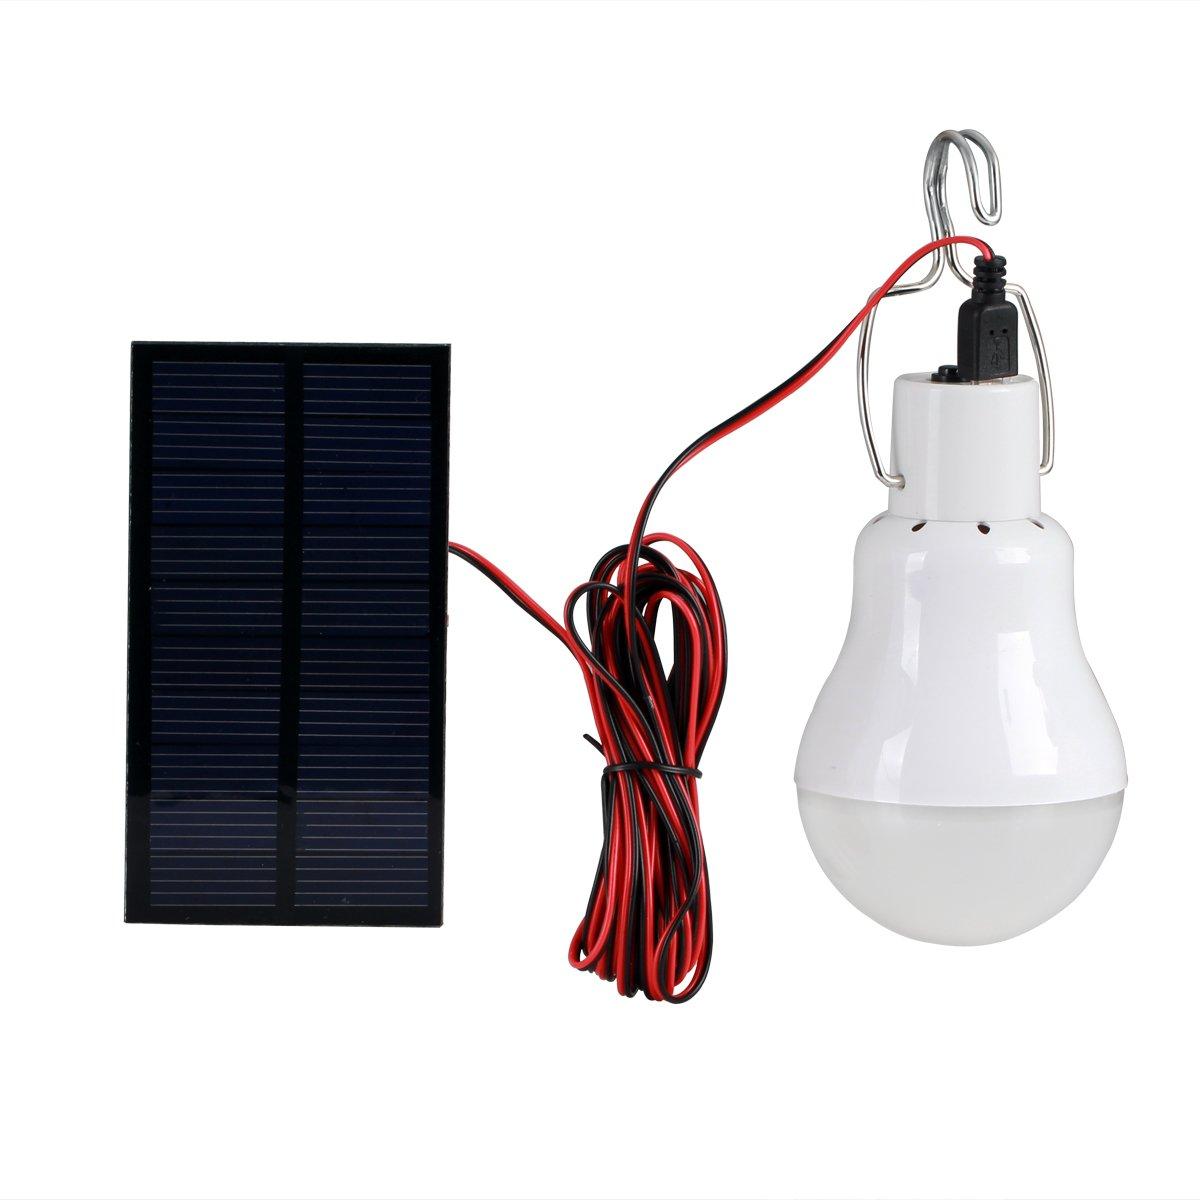 Solar Lights, Solla LED Camping Emergency Light Lantern Bulb with ...